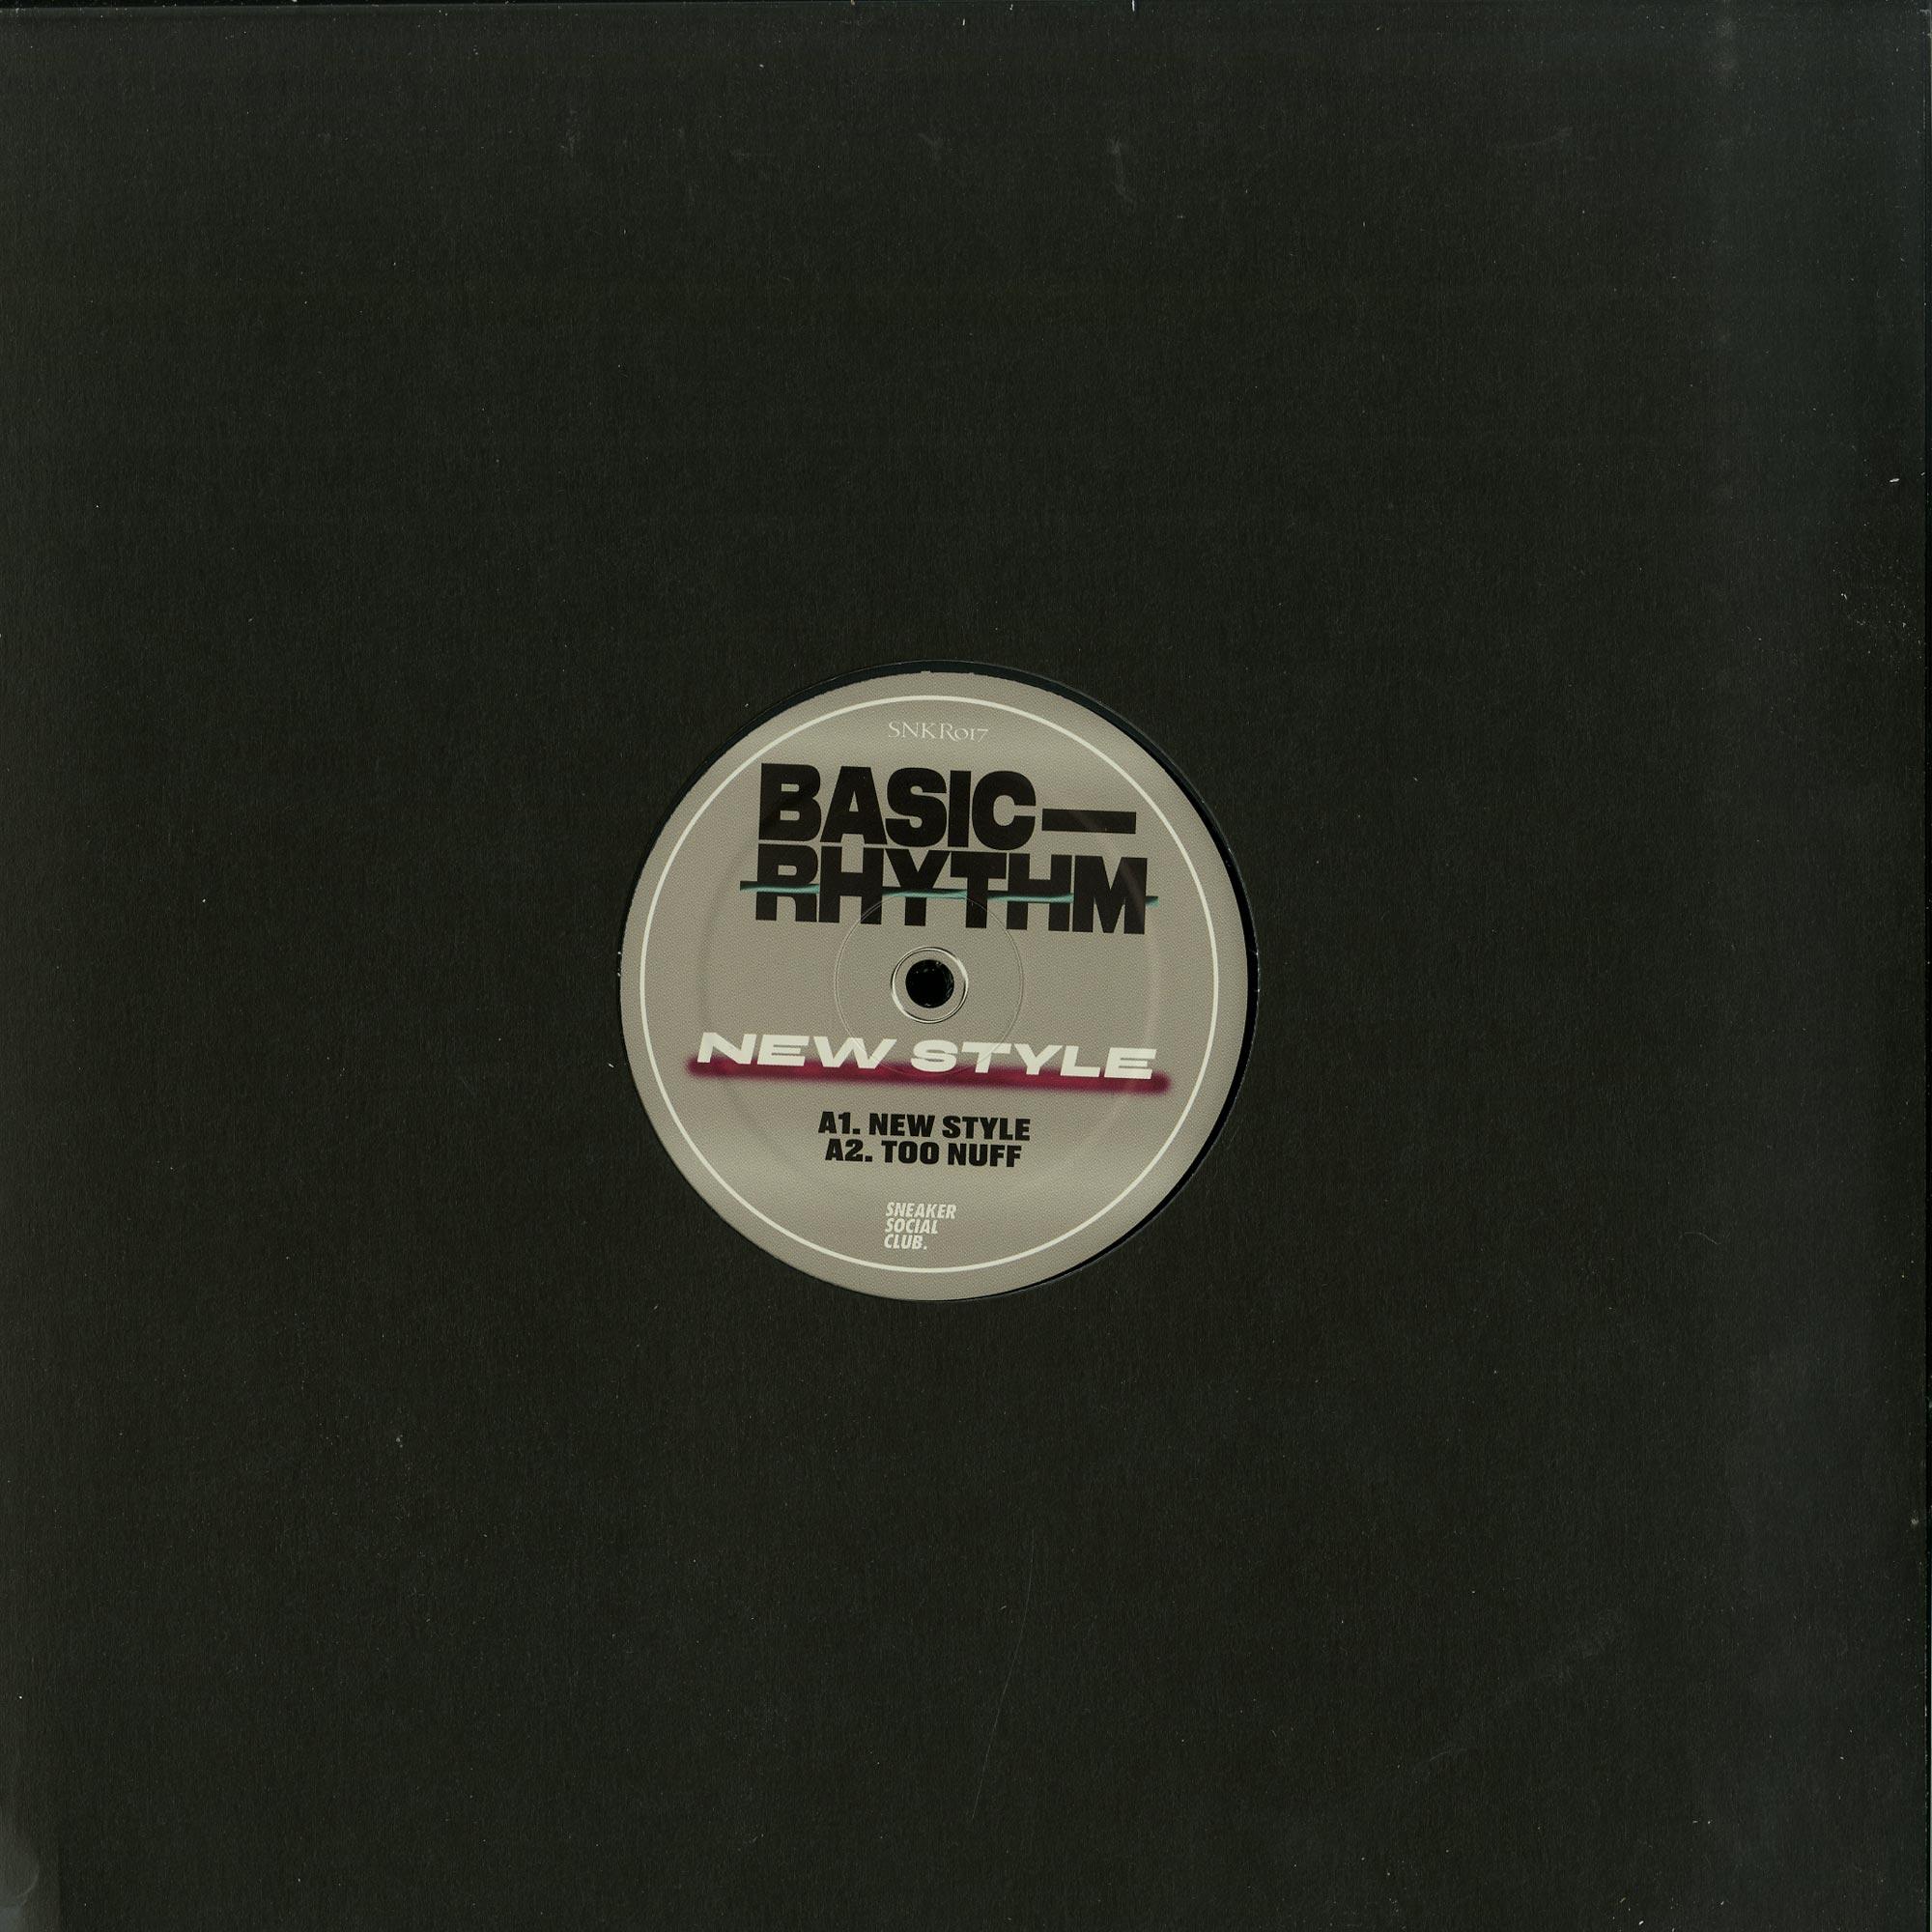 Basic Rhythm - NEW STYLE EP